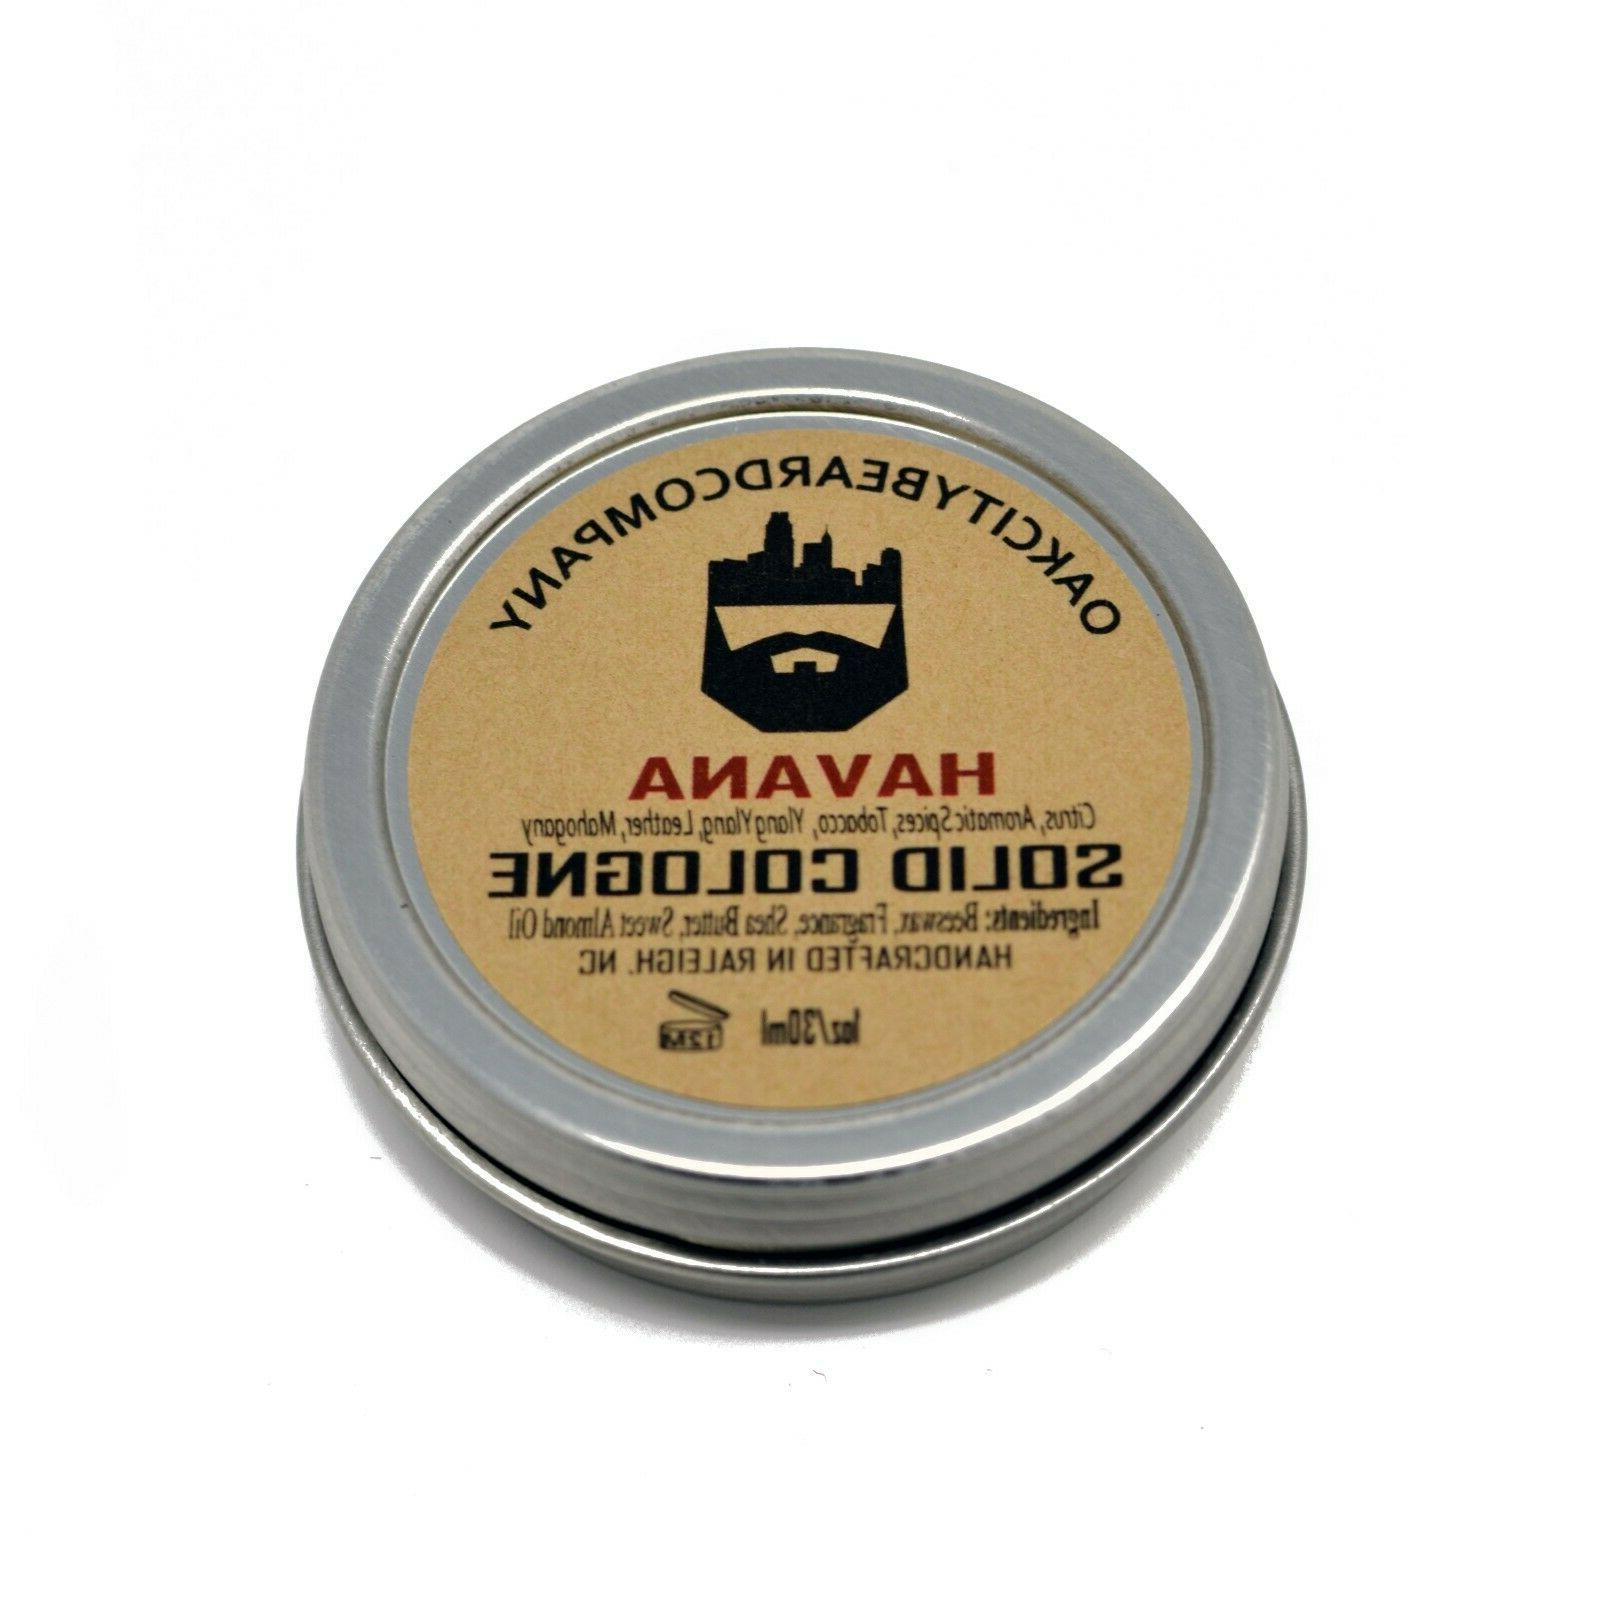 Oak Beard Solid Cologne Natural Oils - 1oz